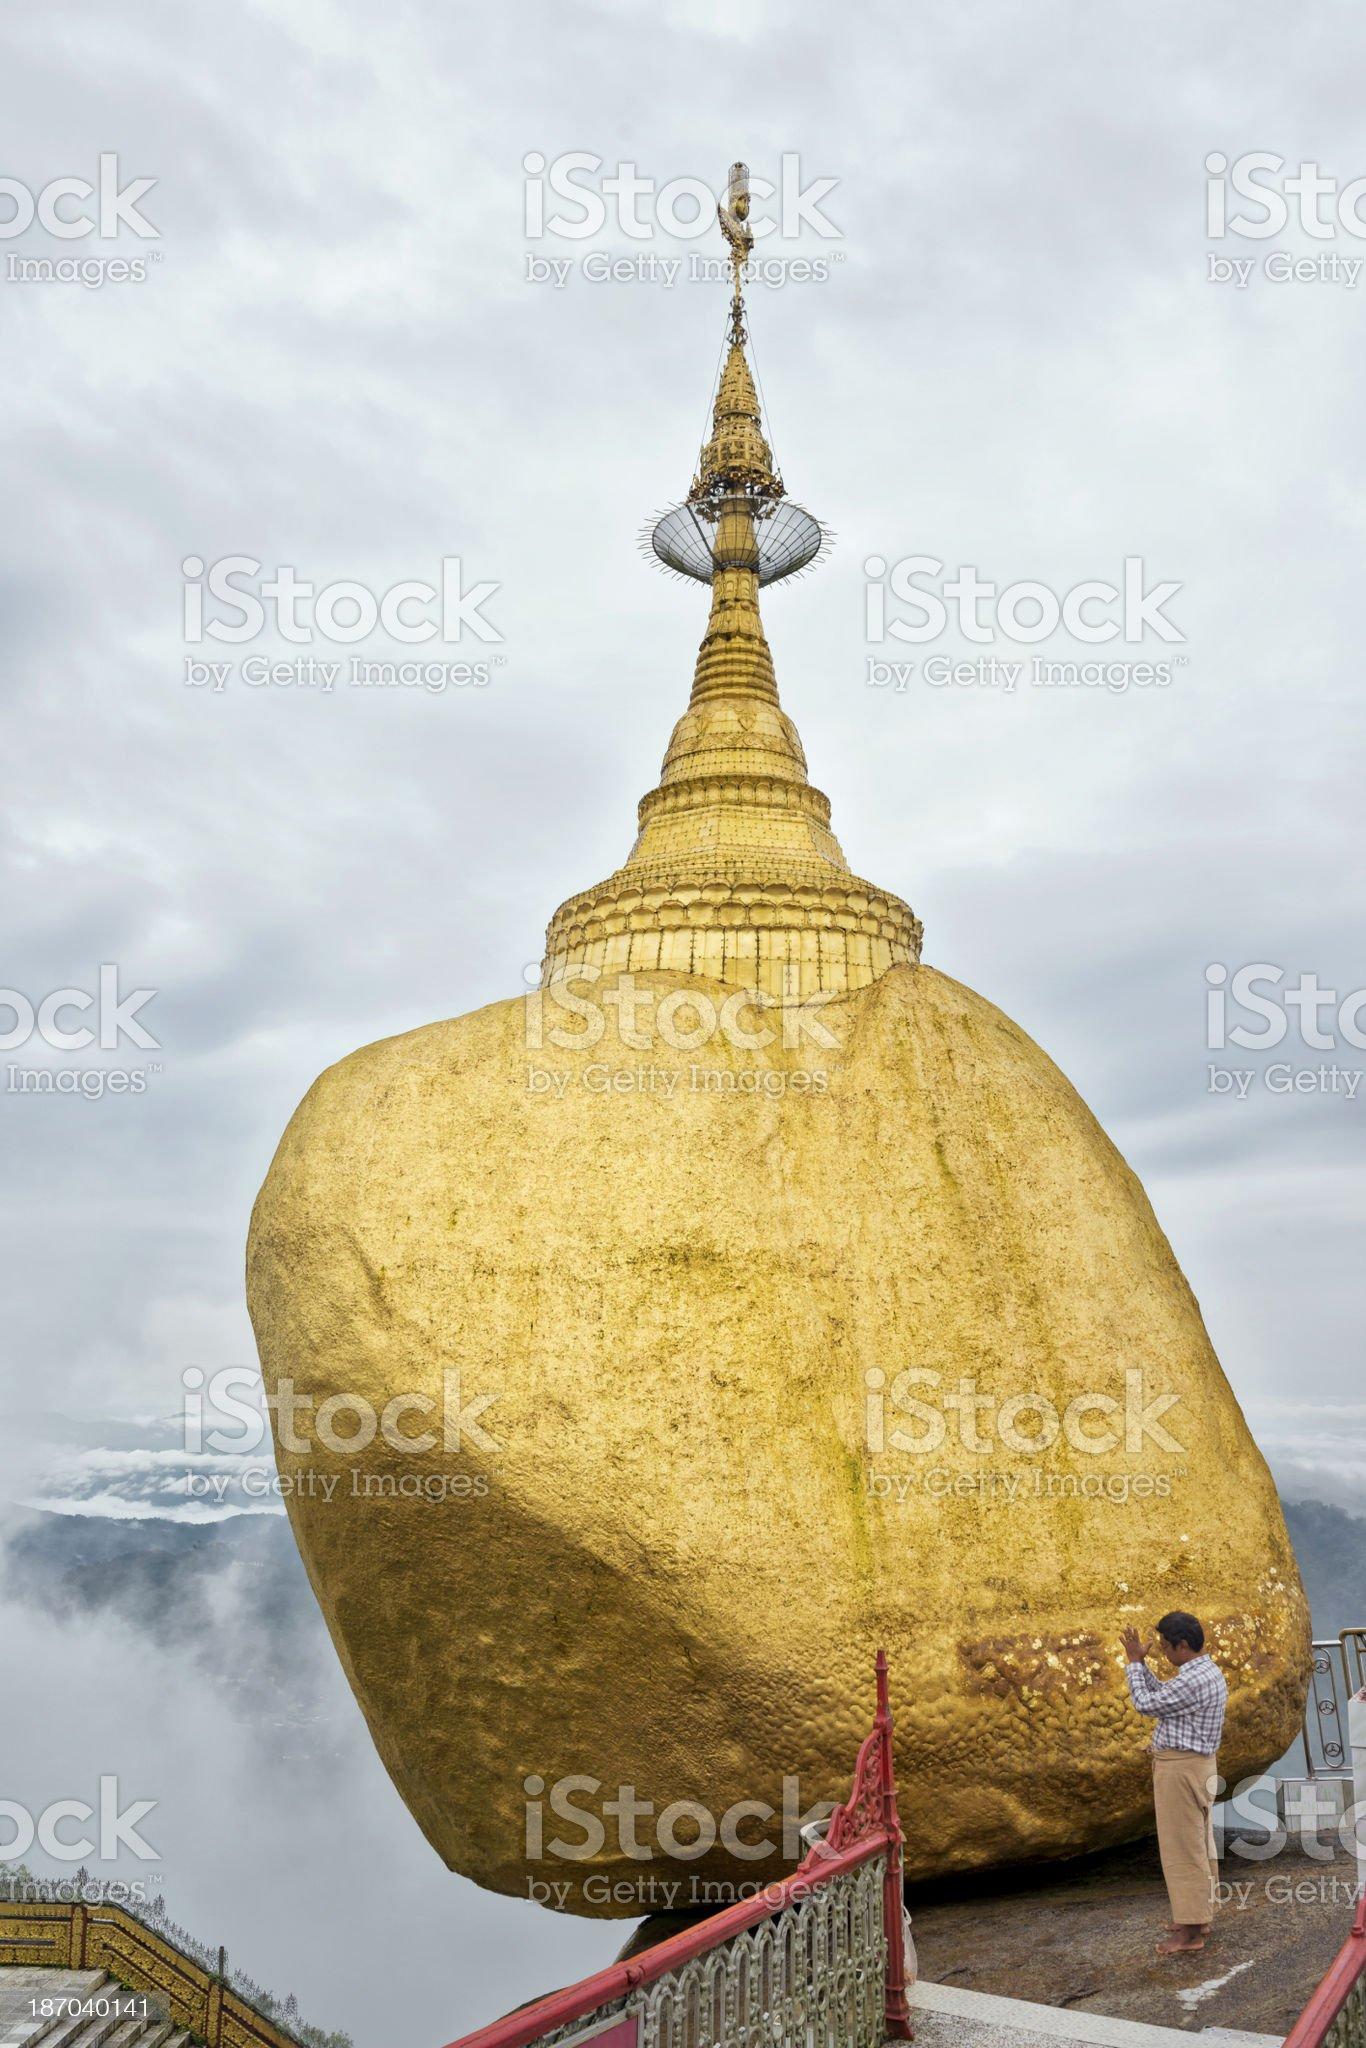 Pilgrim at the Golden Rock royalty-free stock photo